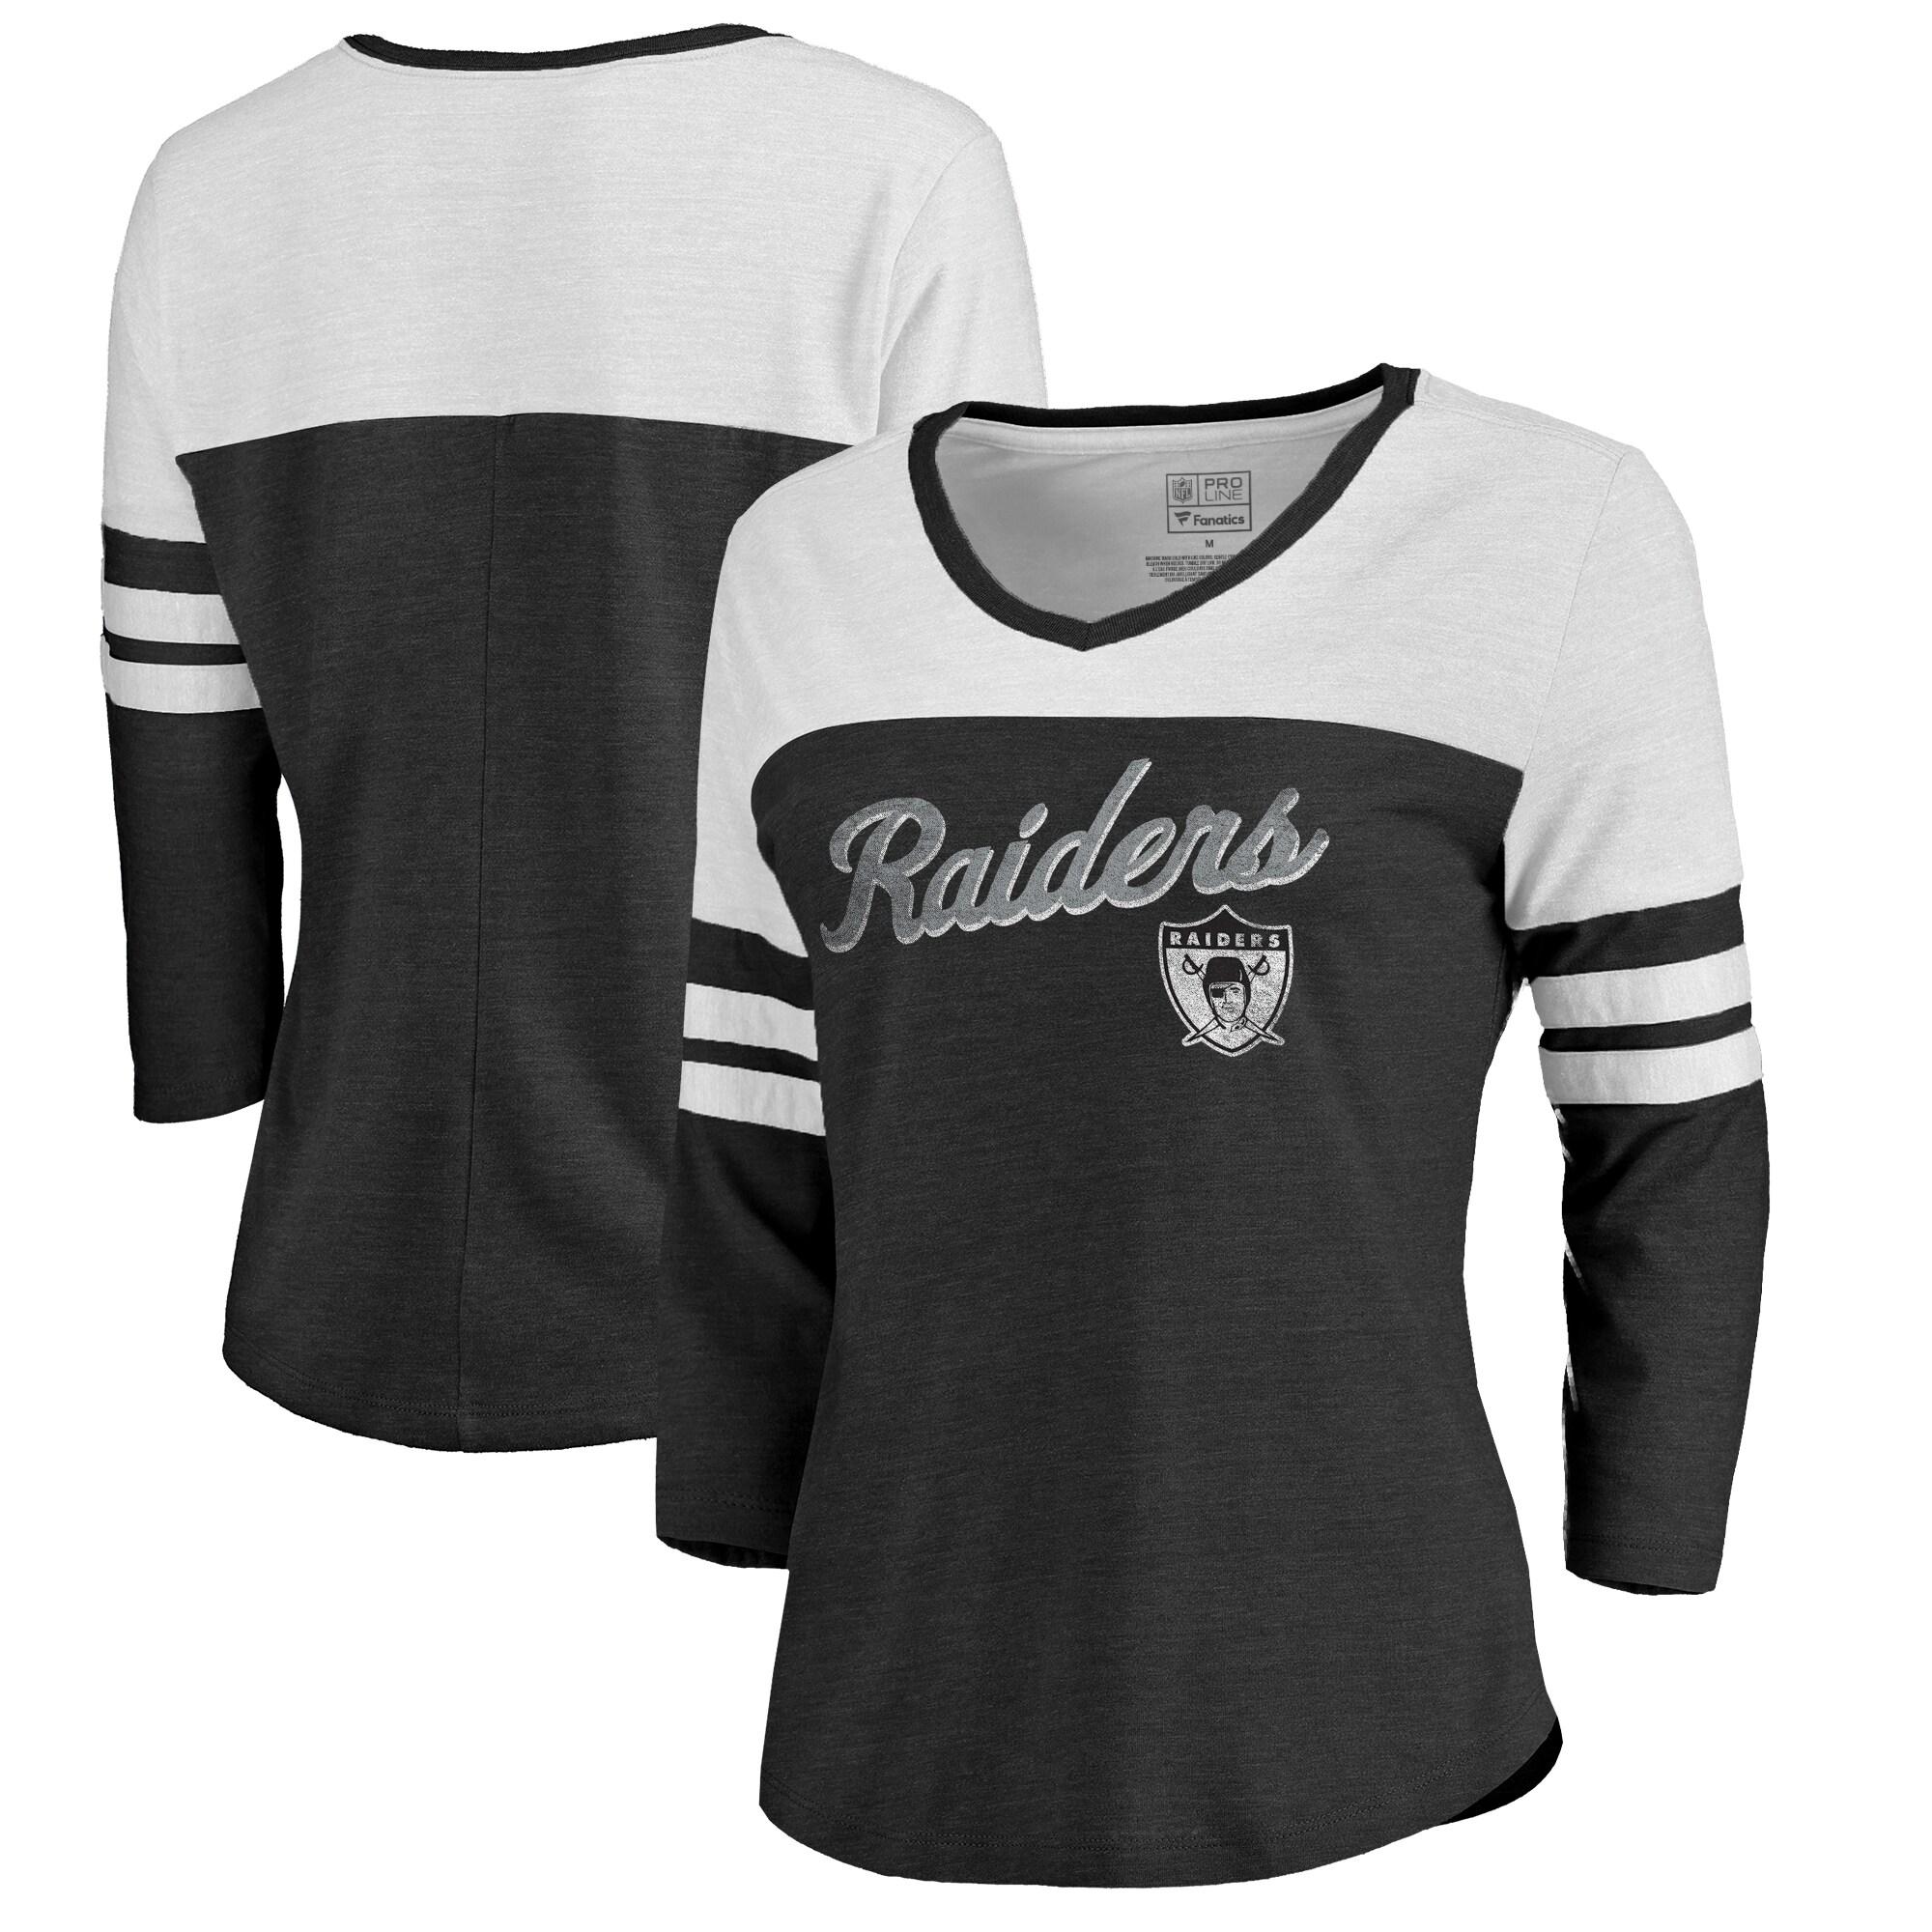 Las Vegas Raiders NFL Pro Line by Fanatics Branded Women's Timeless Collection Rising Script Color Block 3/4 Sleeve Tri-Blend T-Shirt - Black